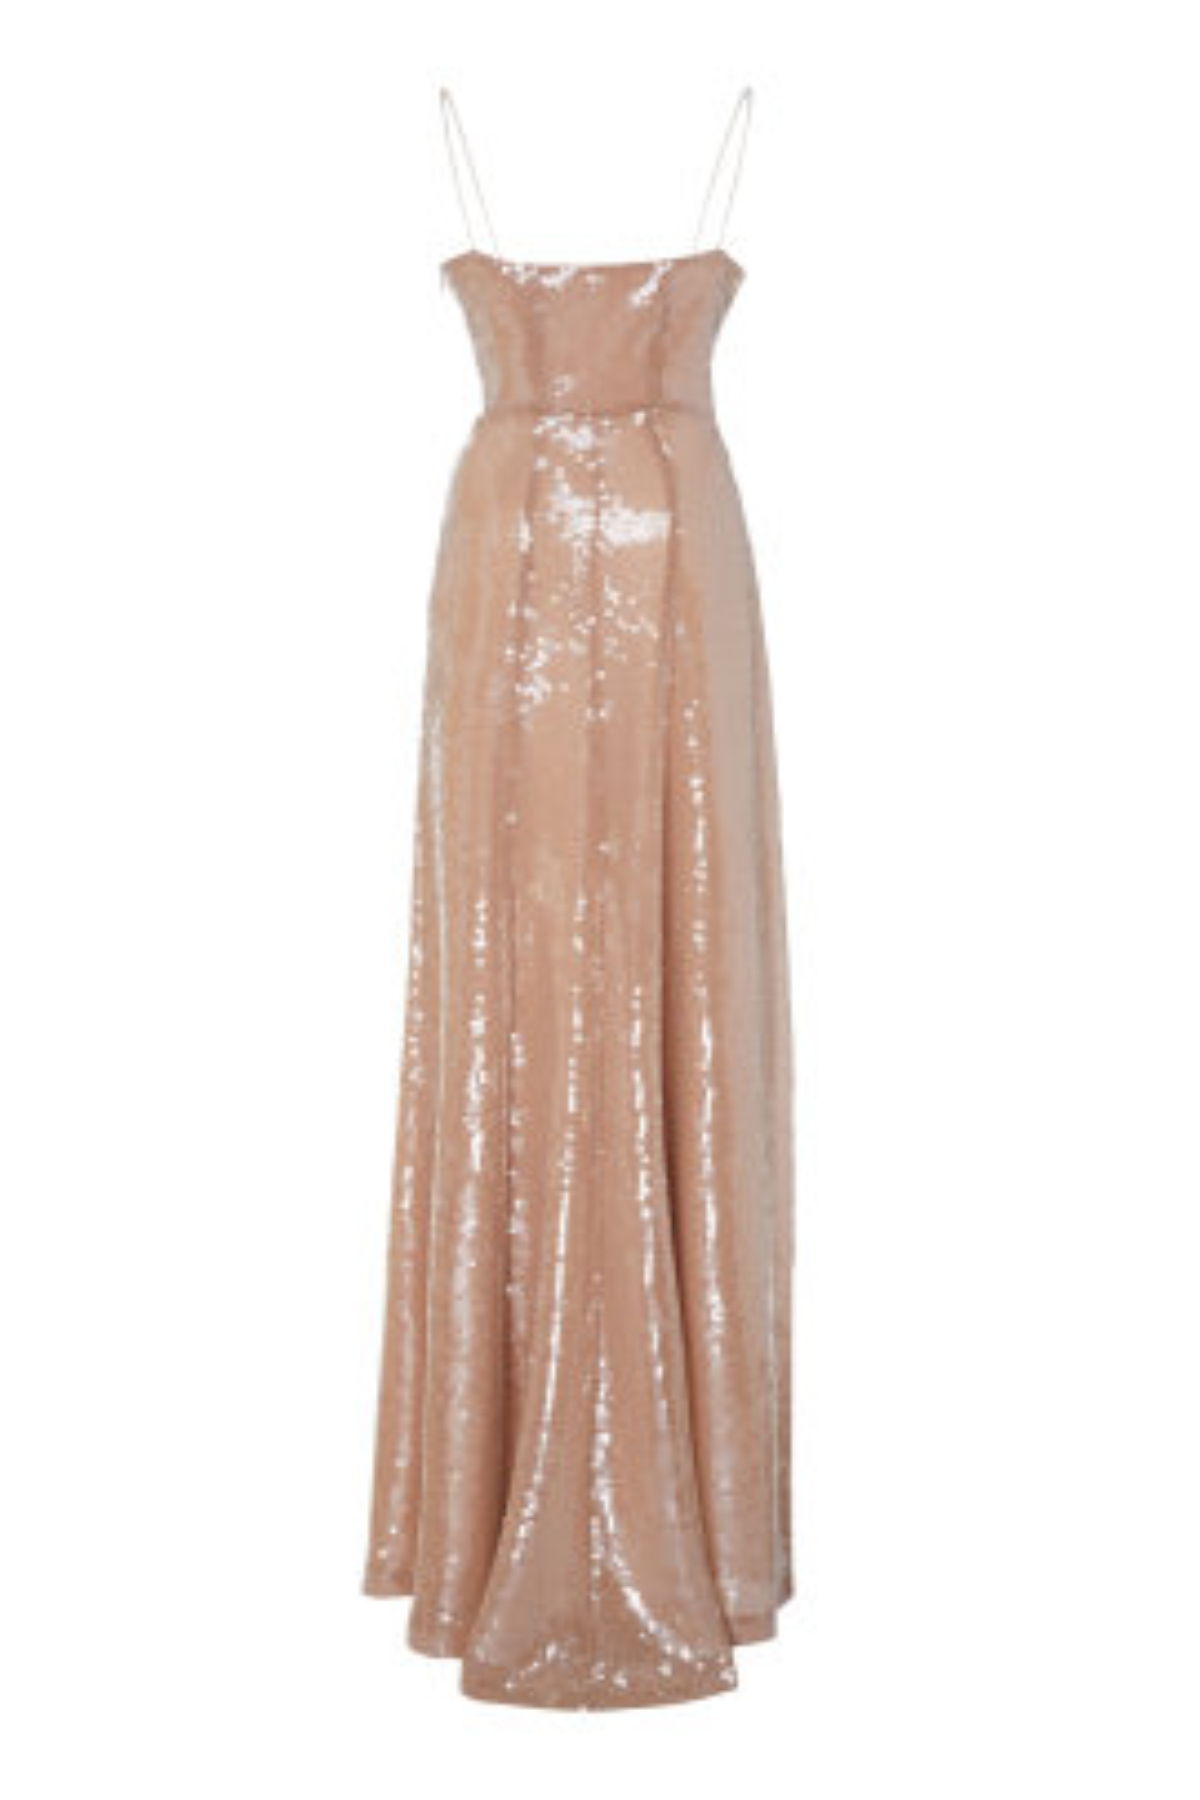 Phoebe Sequin Dress